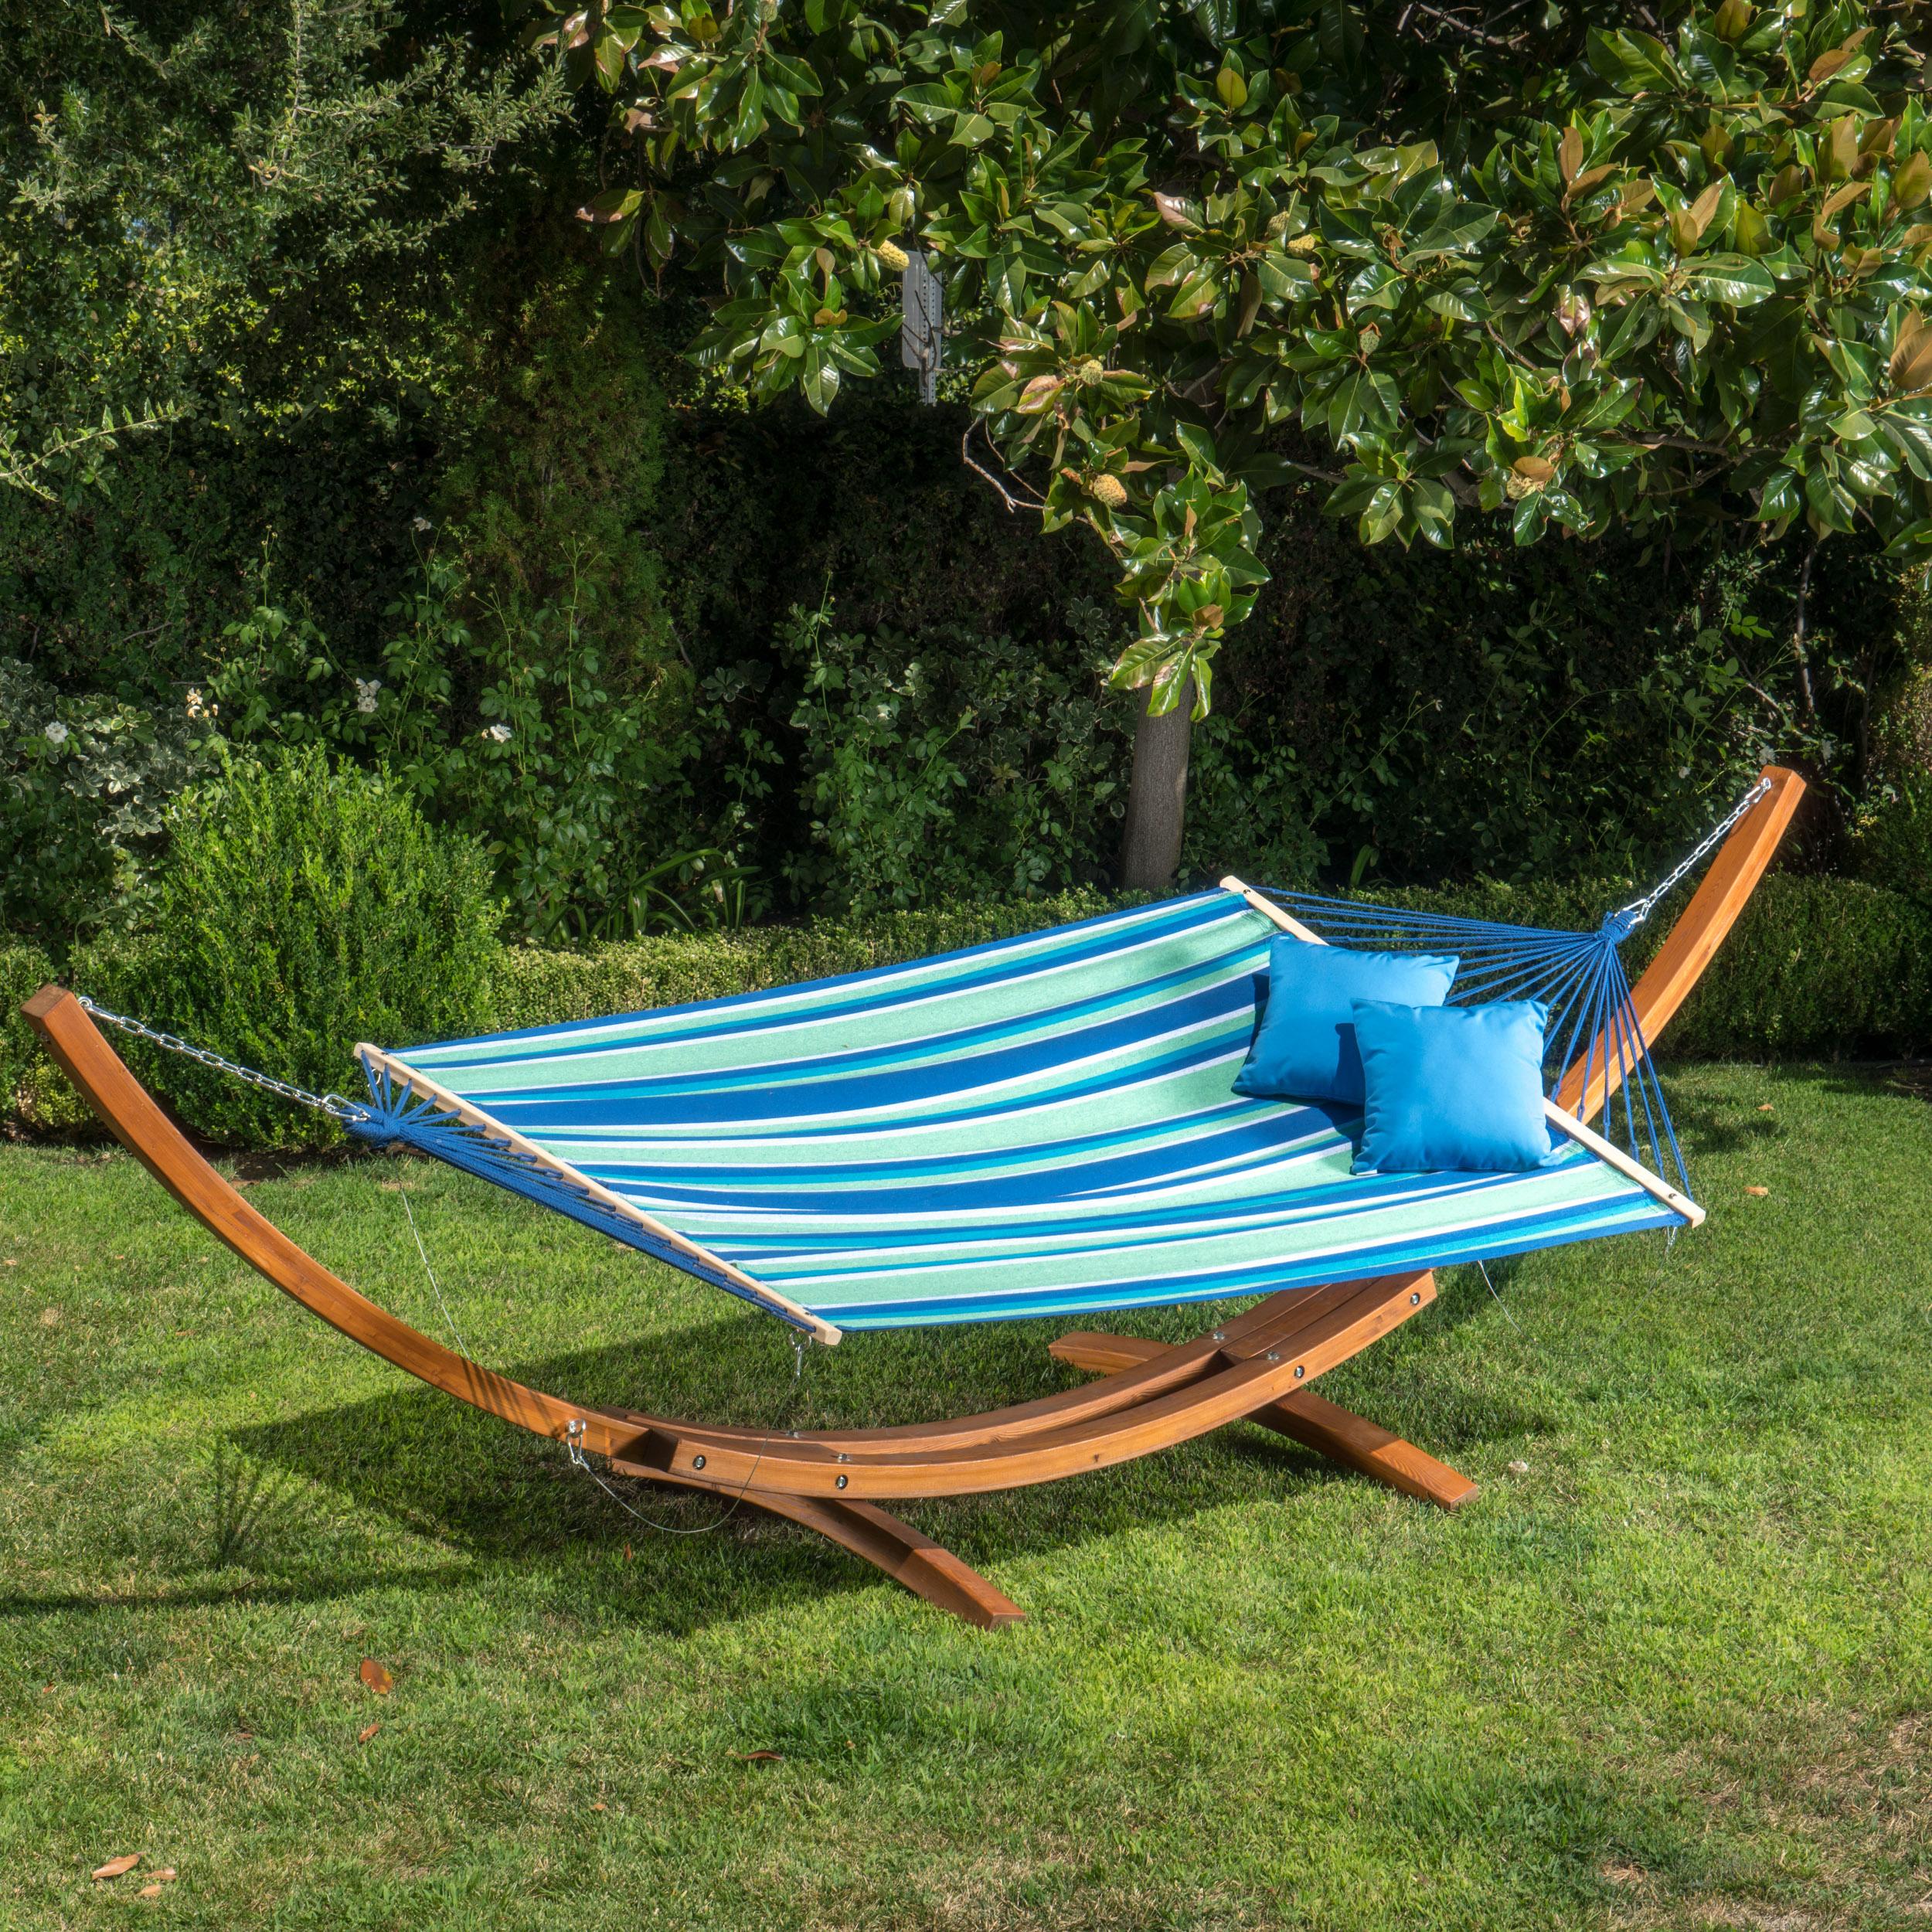 Aniston Outdoor Sunbrella Hammock Fabric (FABRIC ONLY), Blue Green White Stripe